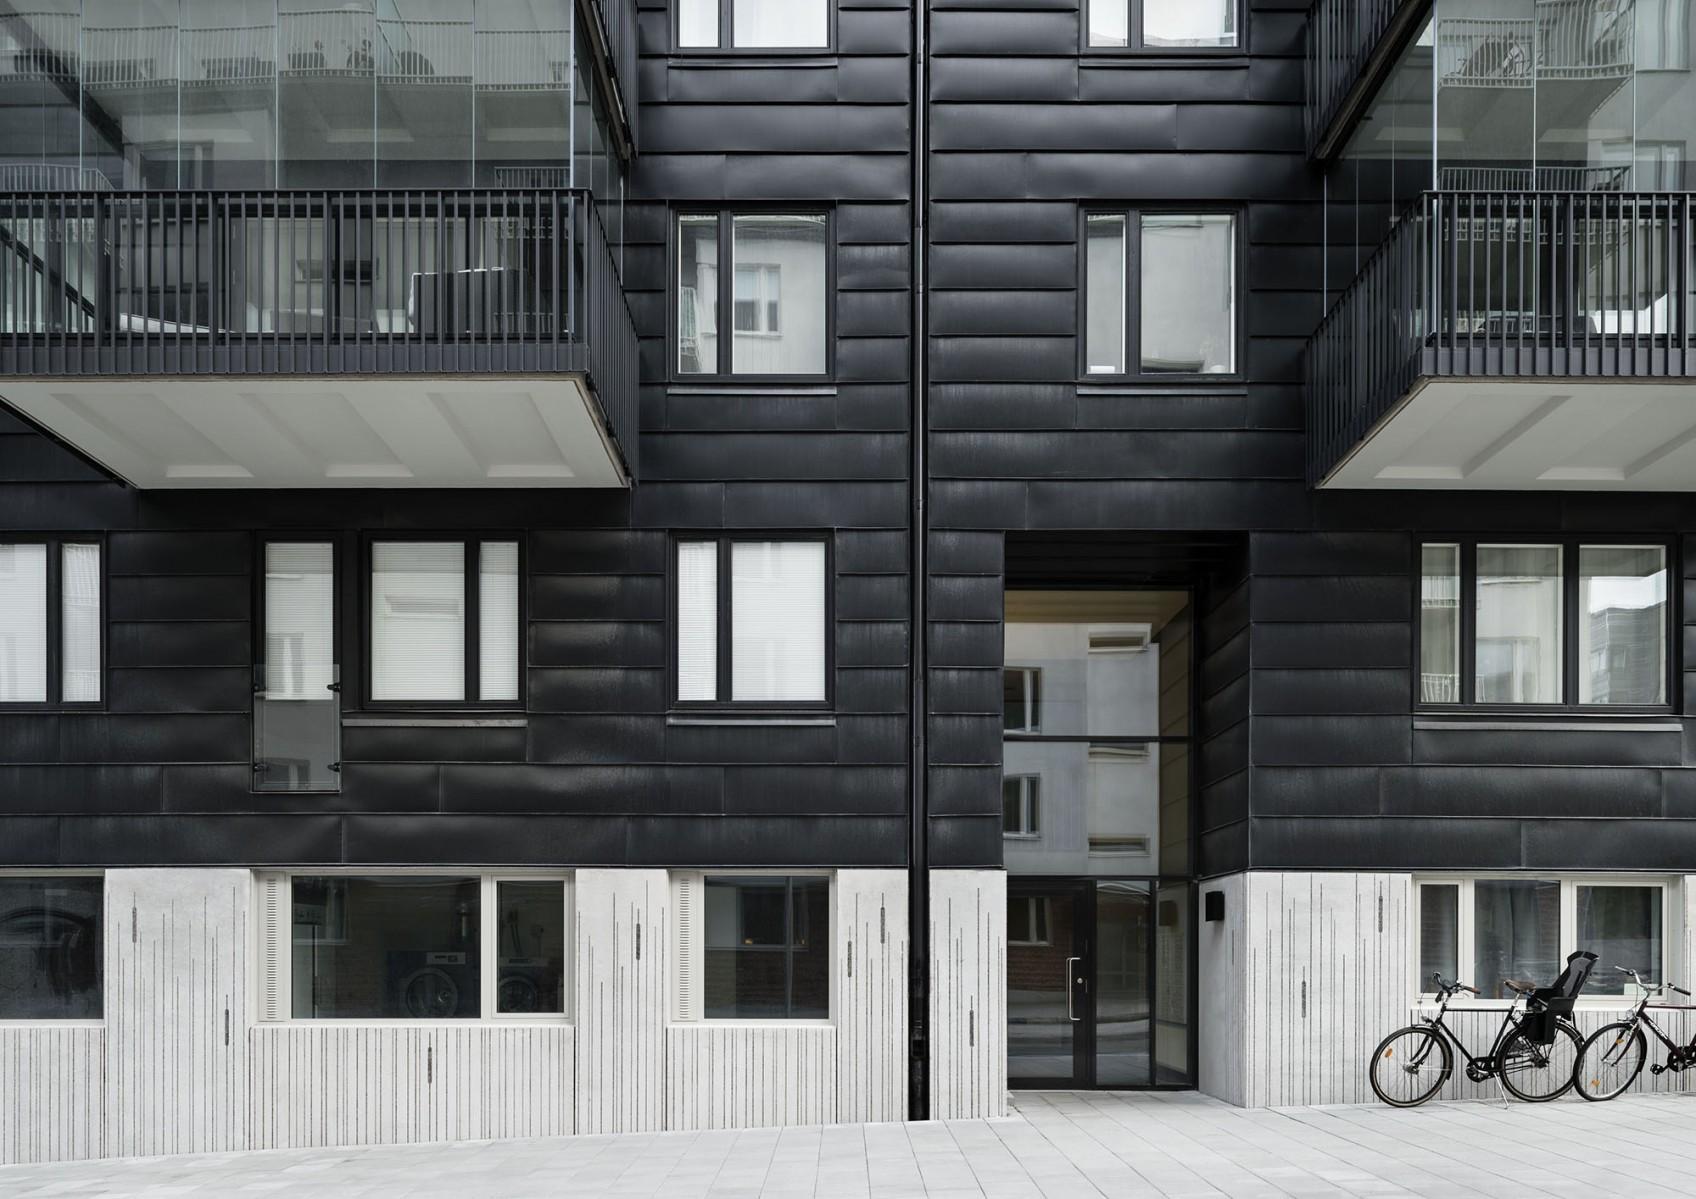 decoration facade elegant faade dcor en pierre with decoration facade decoration facade maison. Black Bedroom Furniture Sets. Home Design Ideas